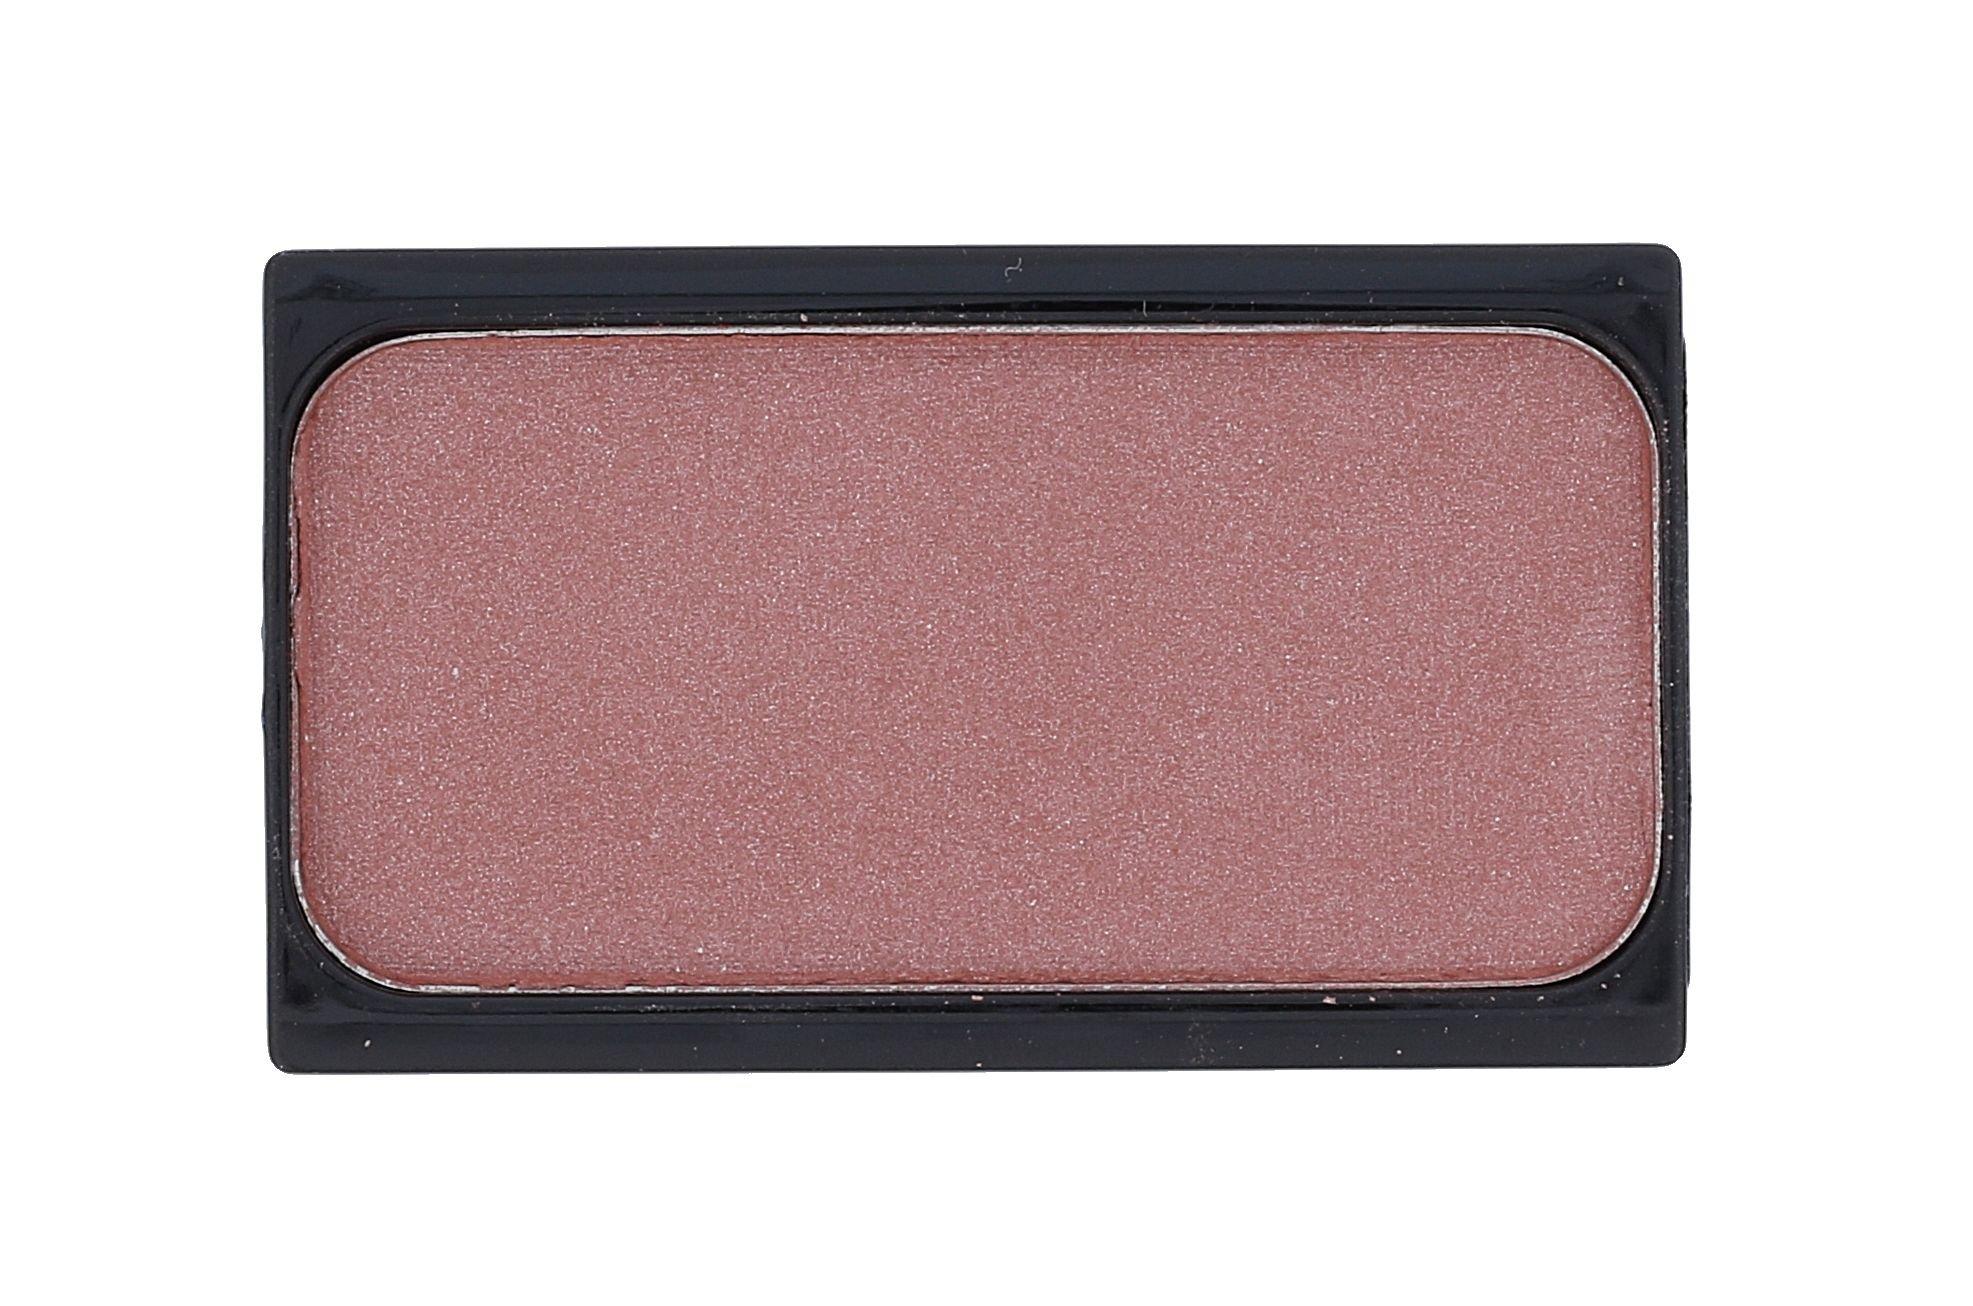 Artdeco Blusher Cosmetic 5ml 48 Carmine Red Blush